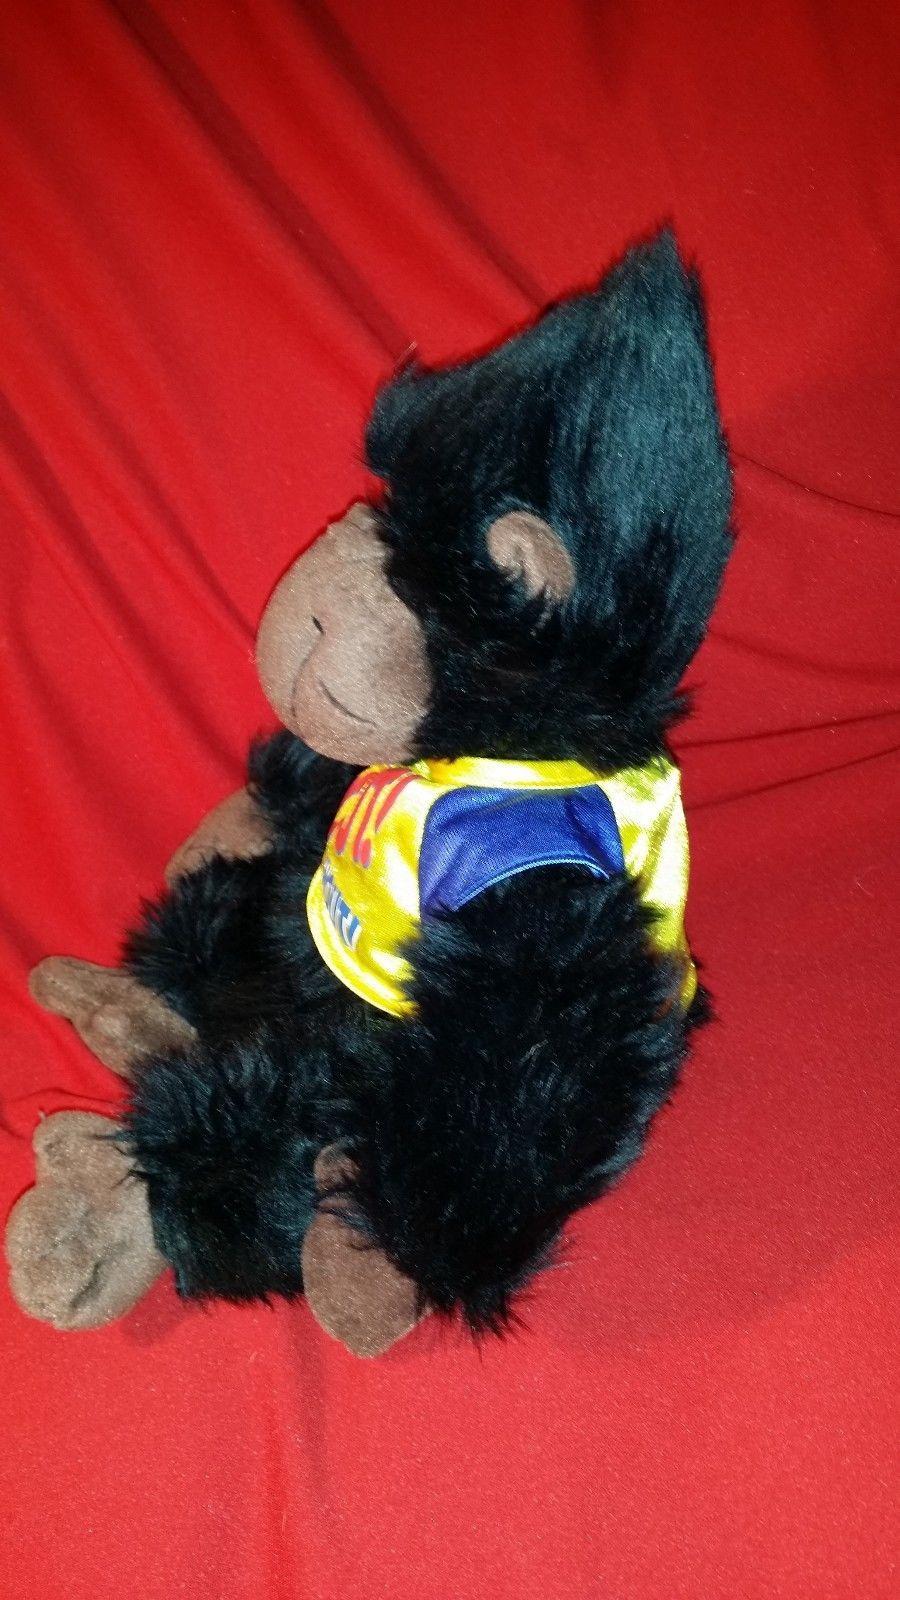 Boys Plush Toys : Lost found shout baby gorilla stuffed animal plush